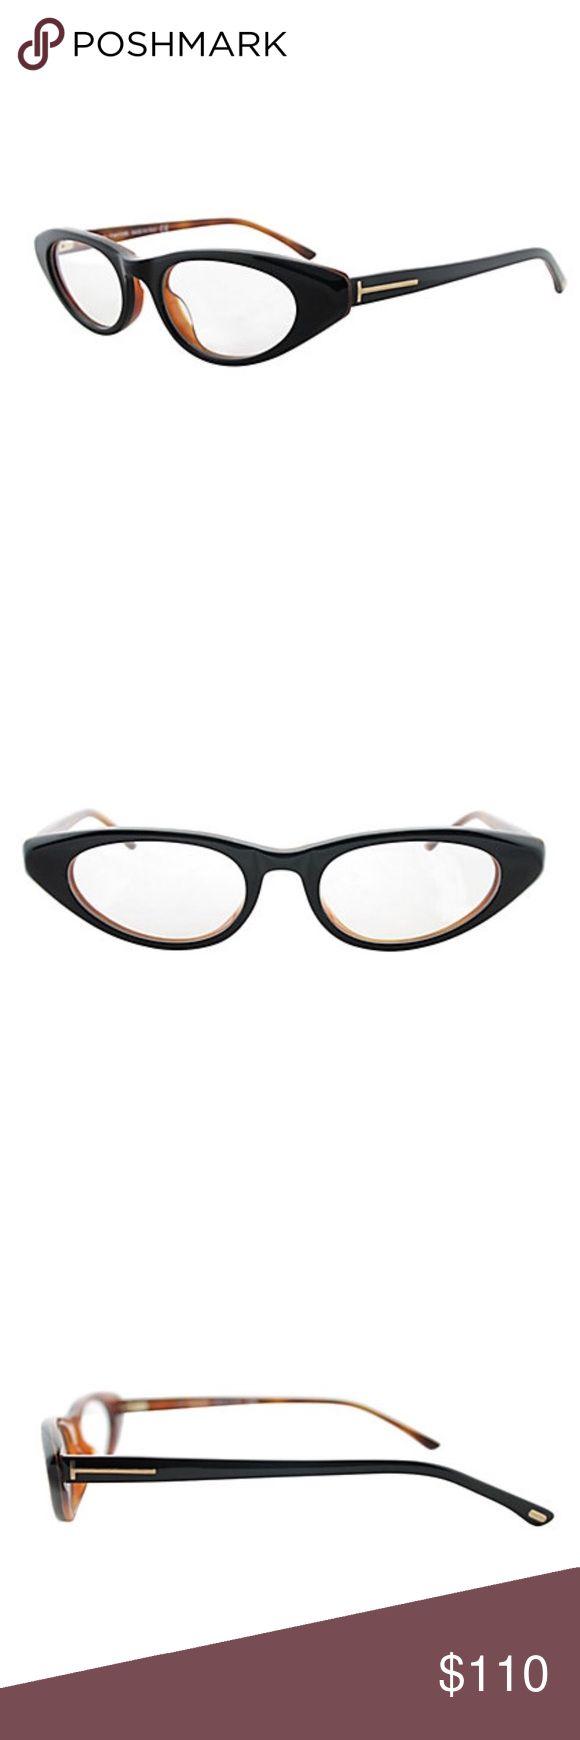 Glasses Frames Wide Bridge : 25+ best ideas about Tom ford glasses frames on Pinterest ...